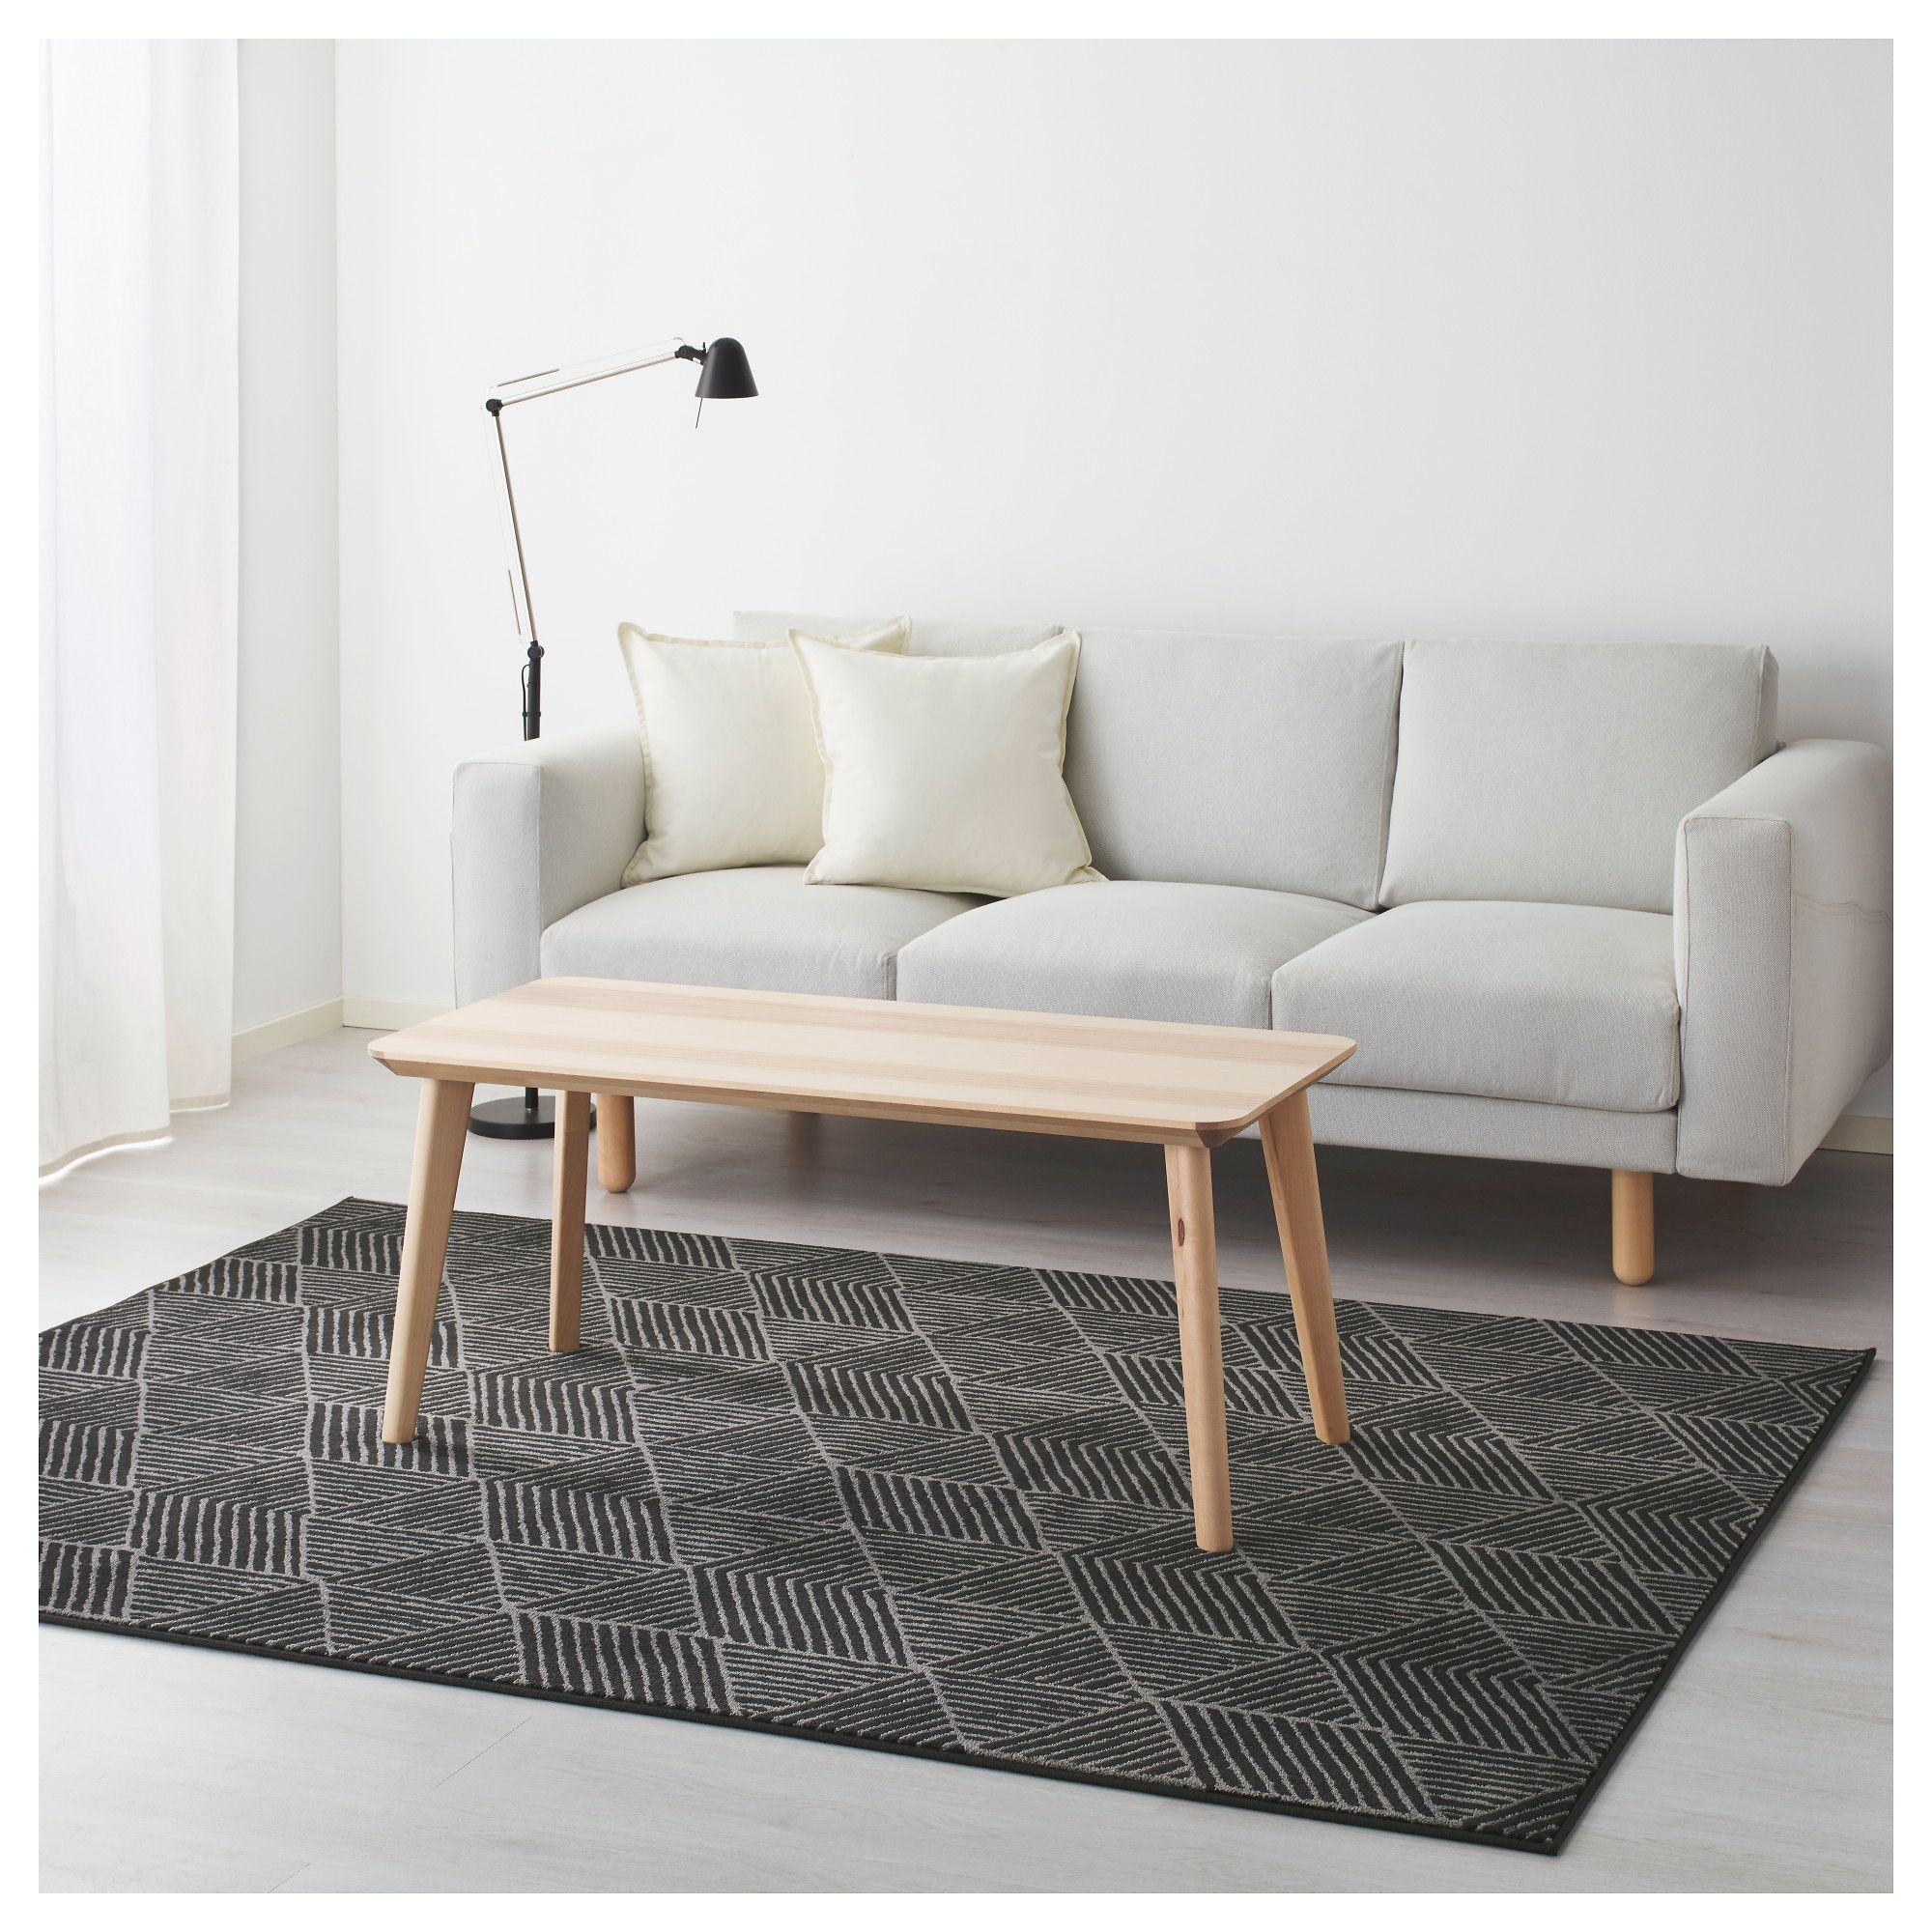 Stenlille Rug Low Pile Grey Ikea Ikea Rug Ikea Carpet Design [ 2000 x 2000 Pixel ]